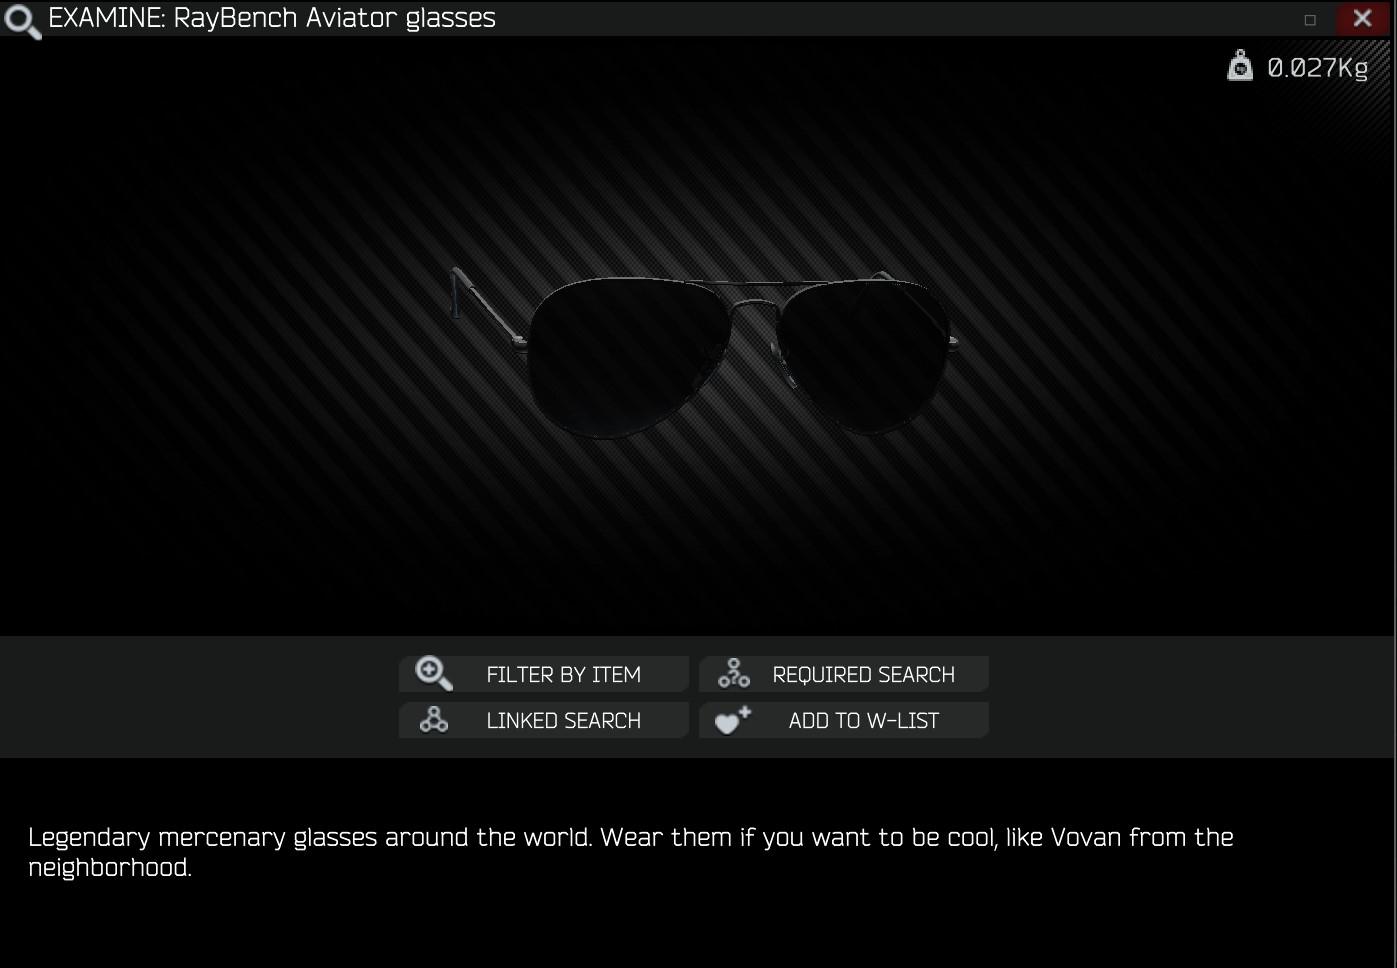 RayBench Aviator glasses.jpg